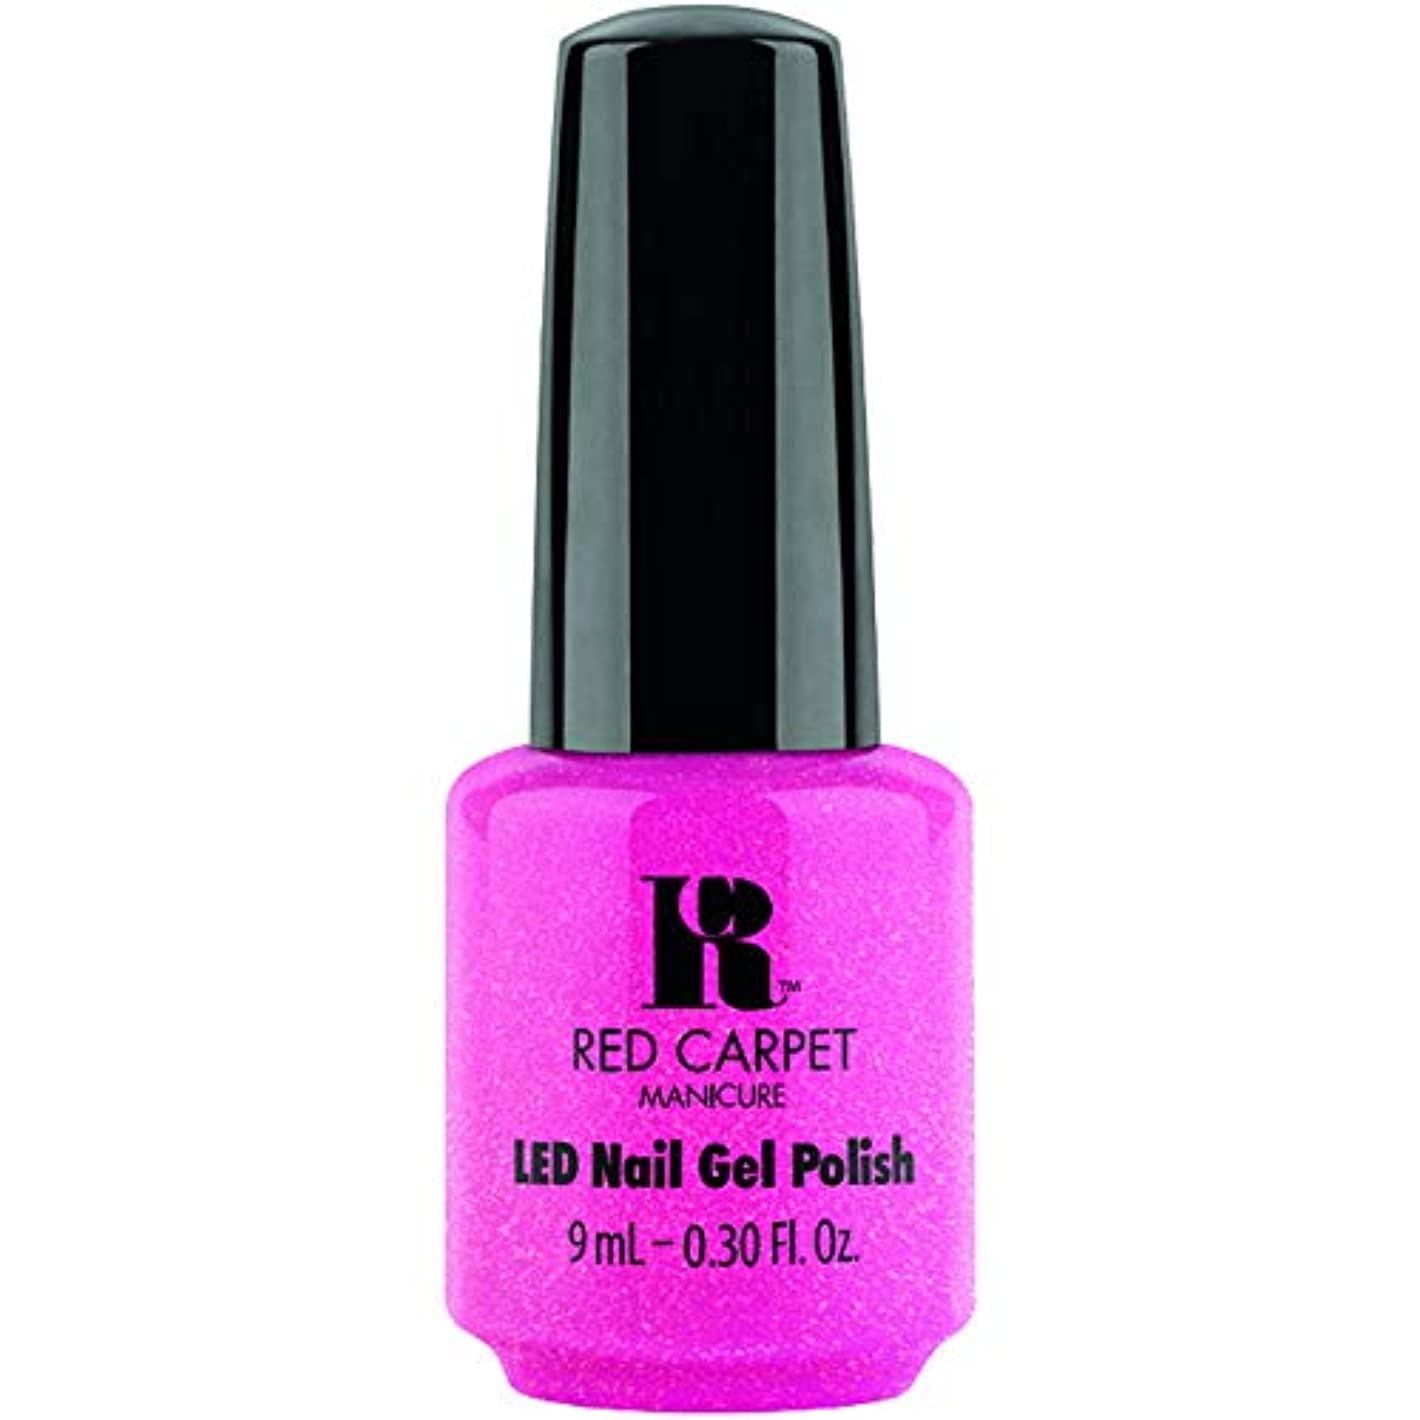 Red Carpet Manicure - LED Nail Gel Polish - A-Muse Me - 0.3oz / 9ml